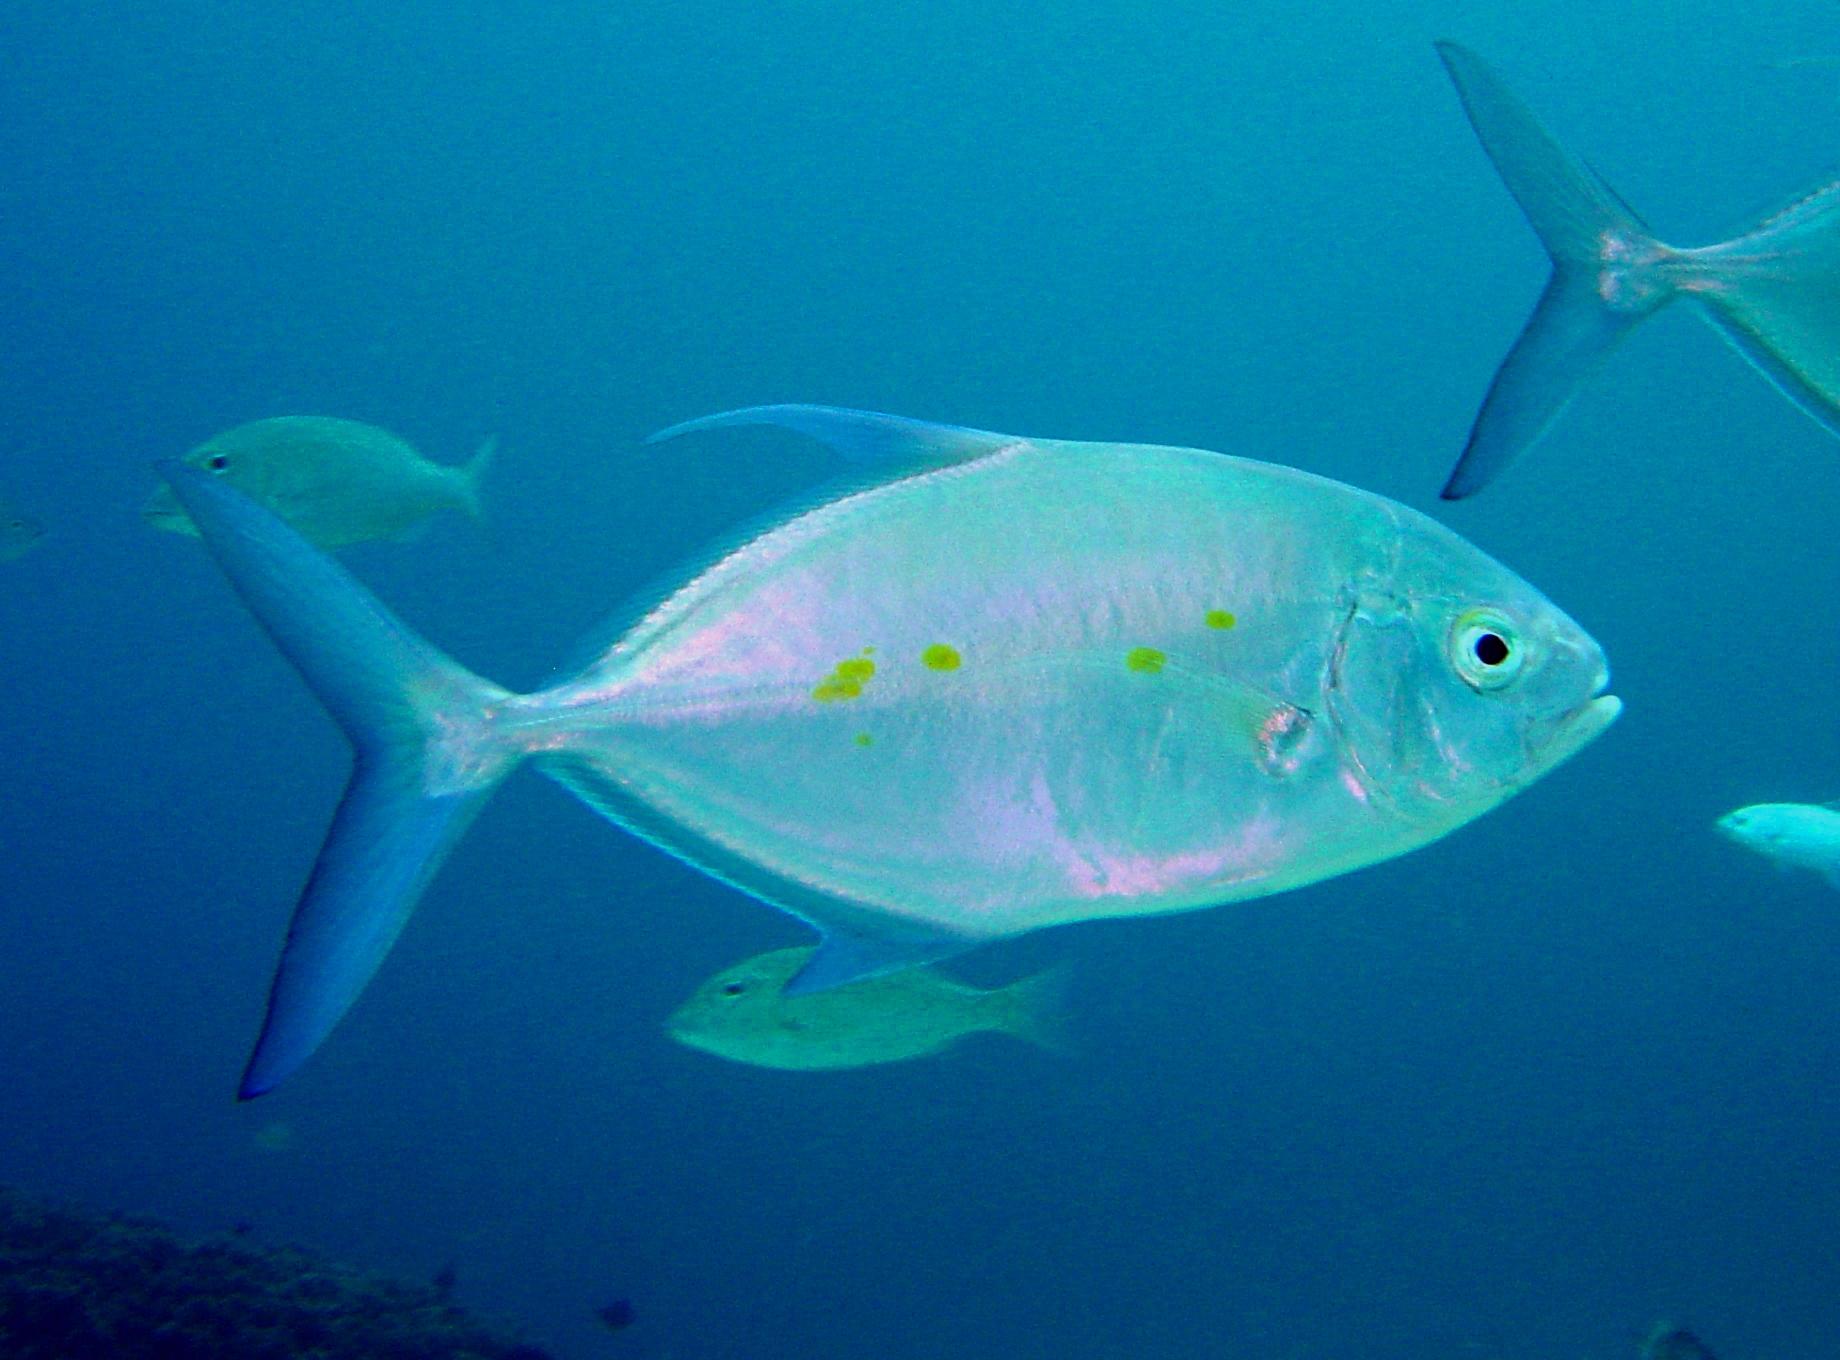 GT family - bluefin trevally plat N - YouTube